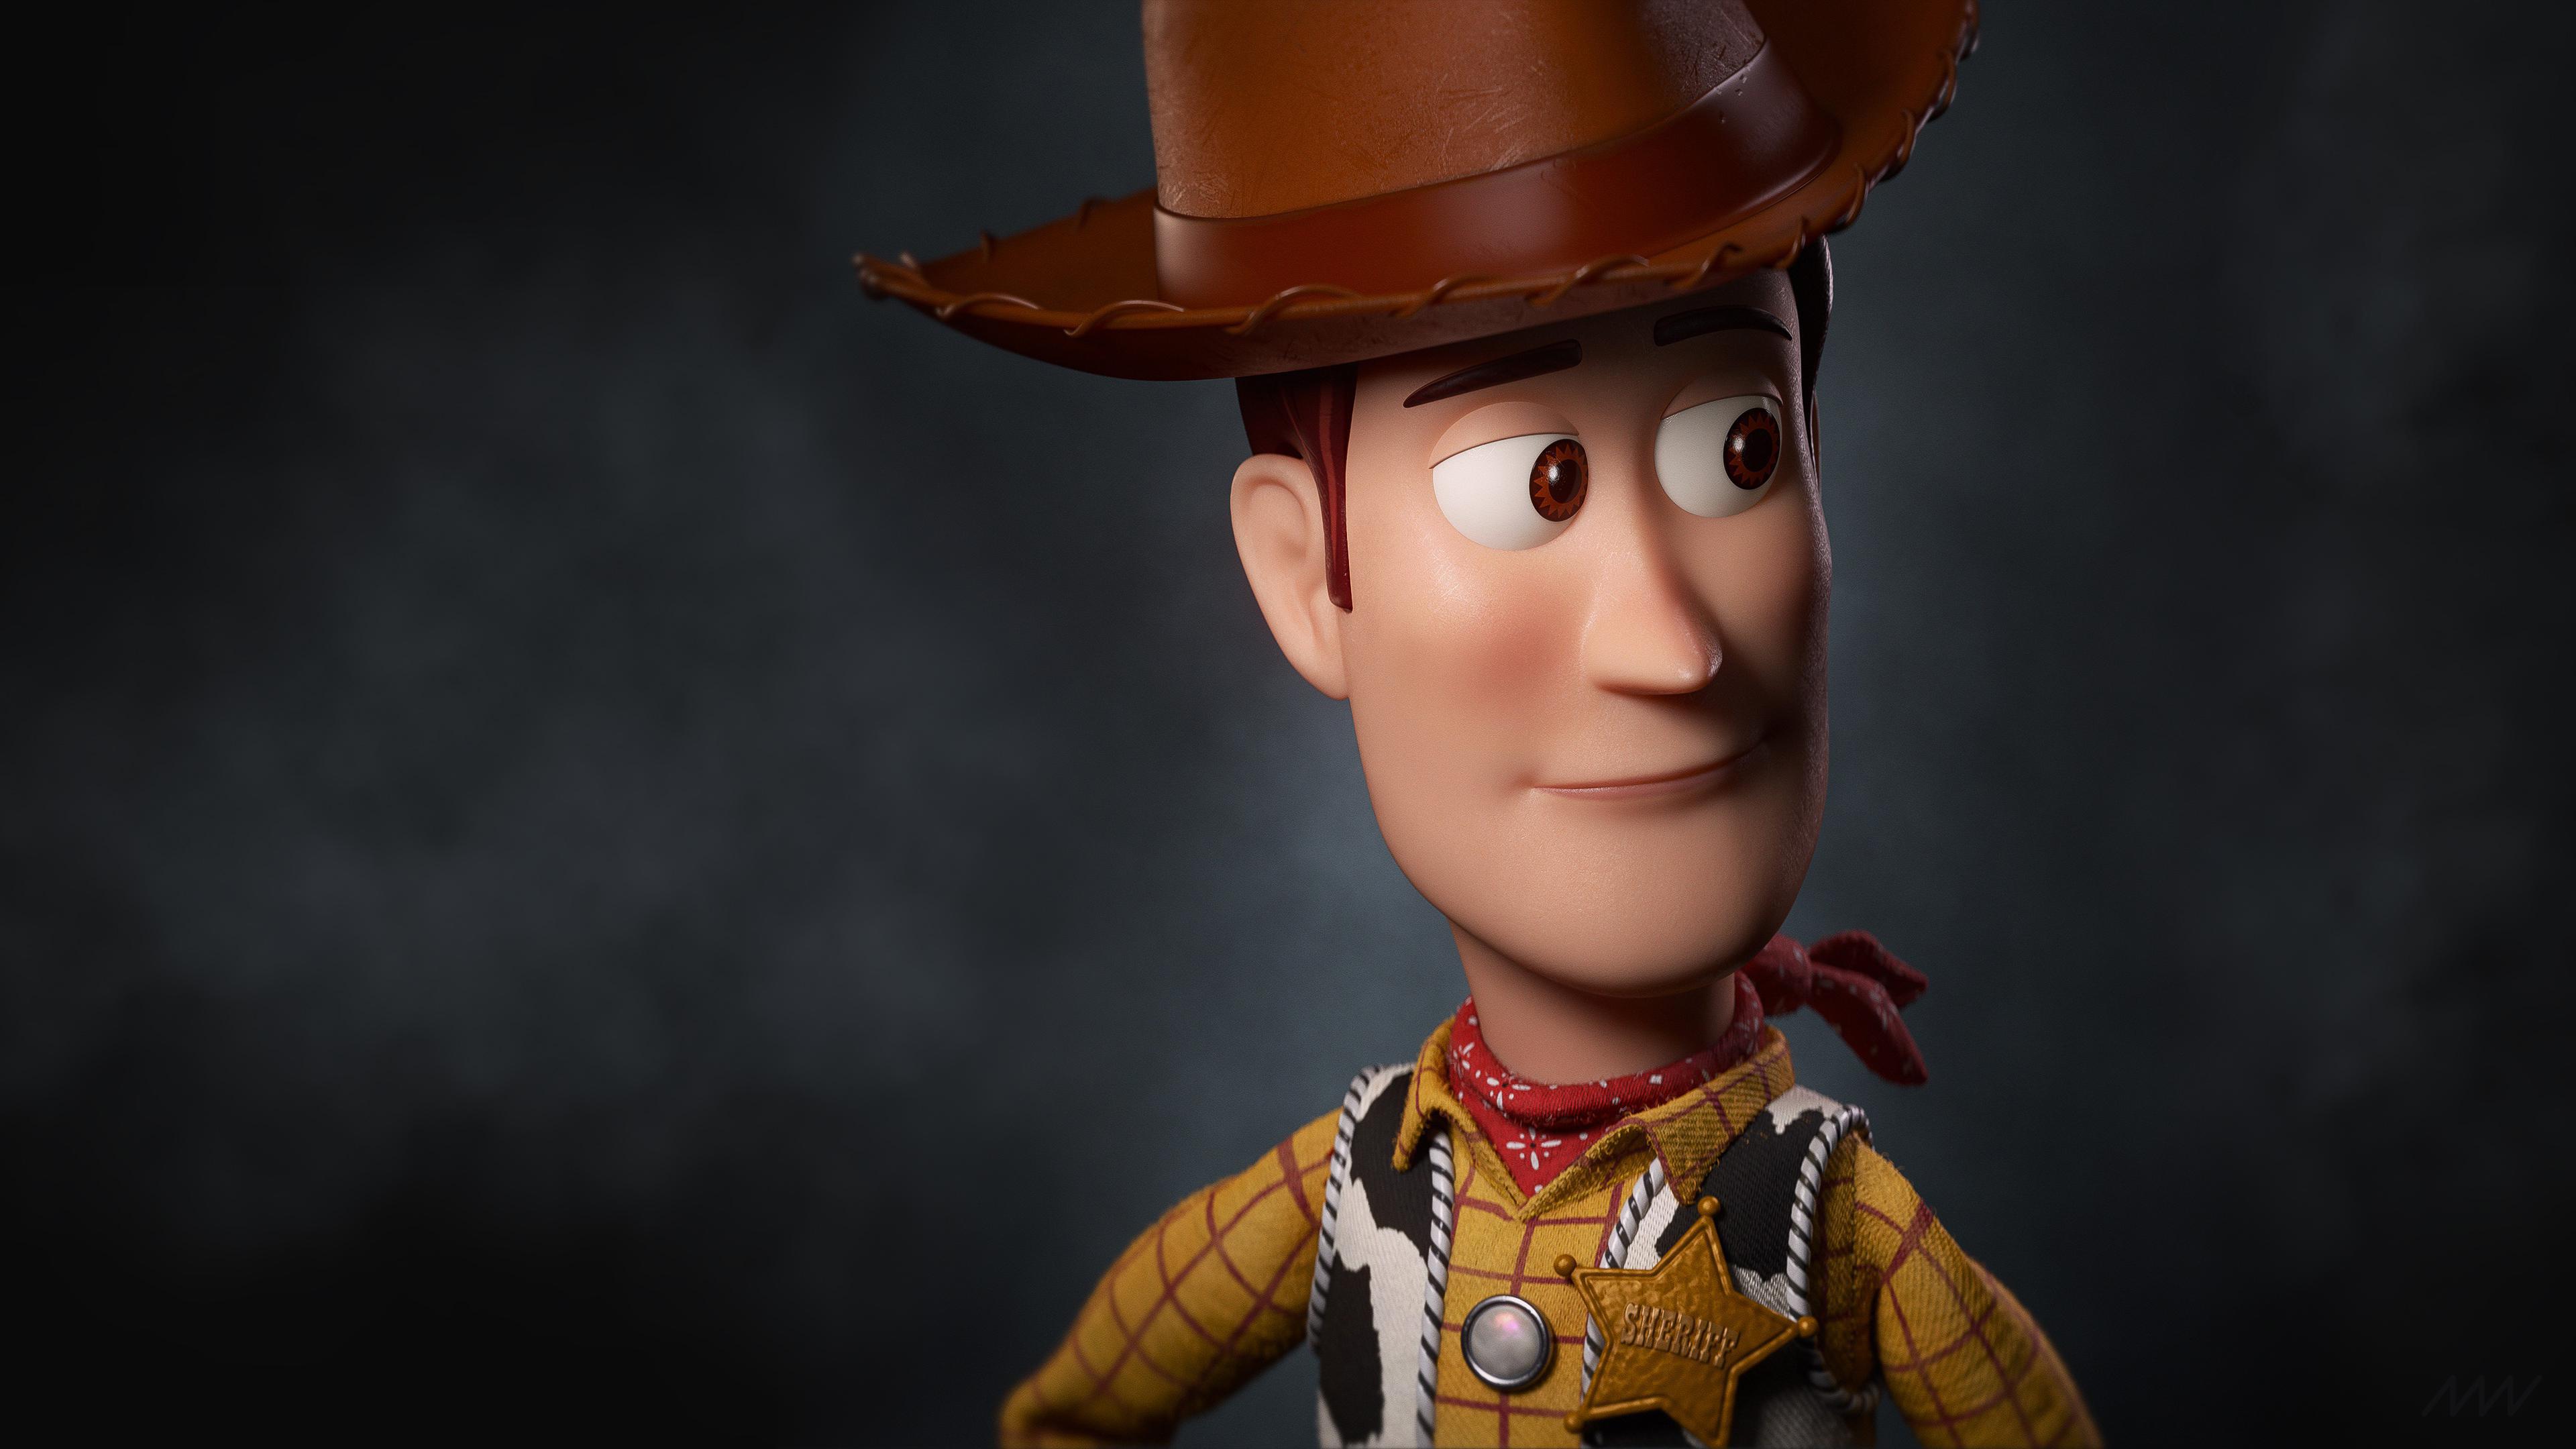 Toy Story 4 4k - 3840x2160 - Download HD Wallpaper ...